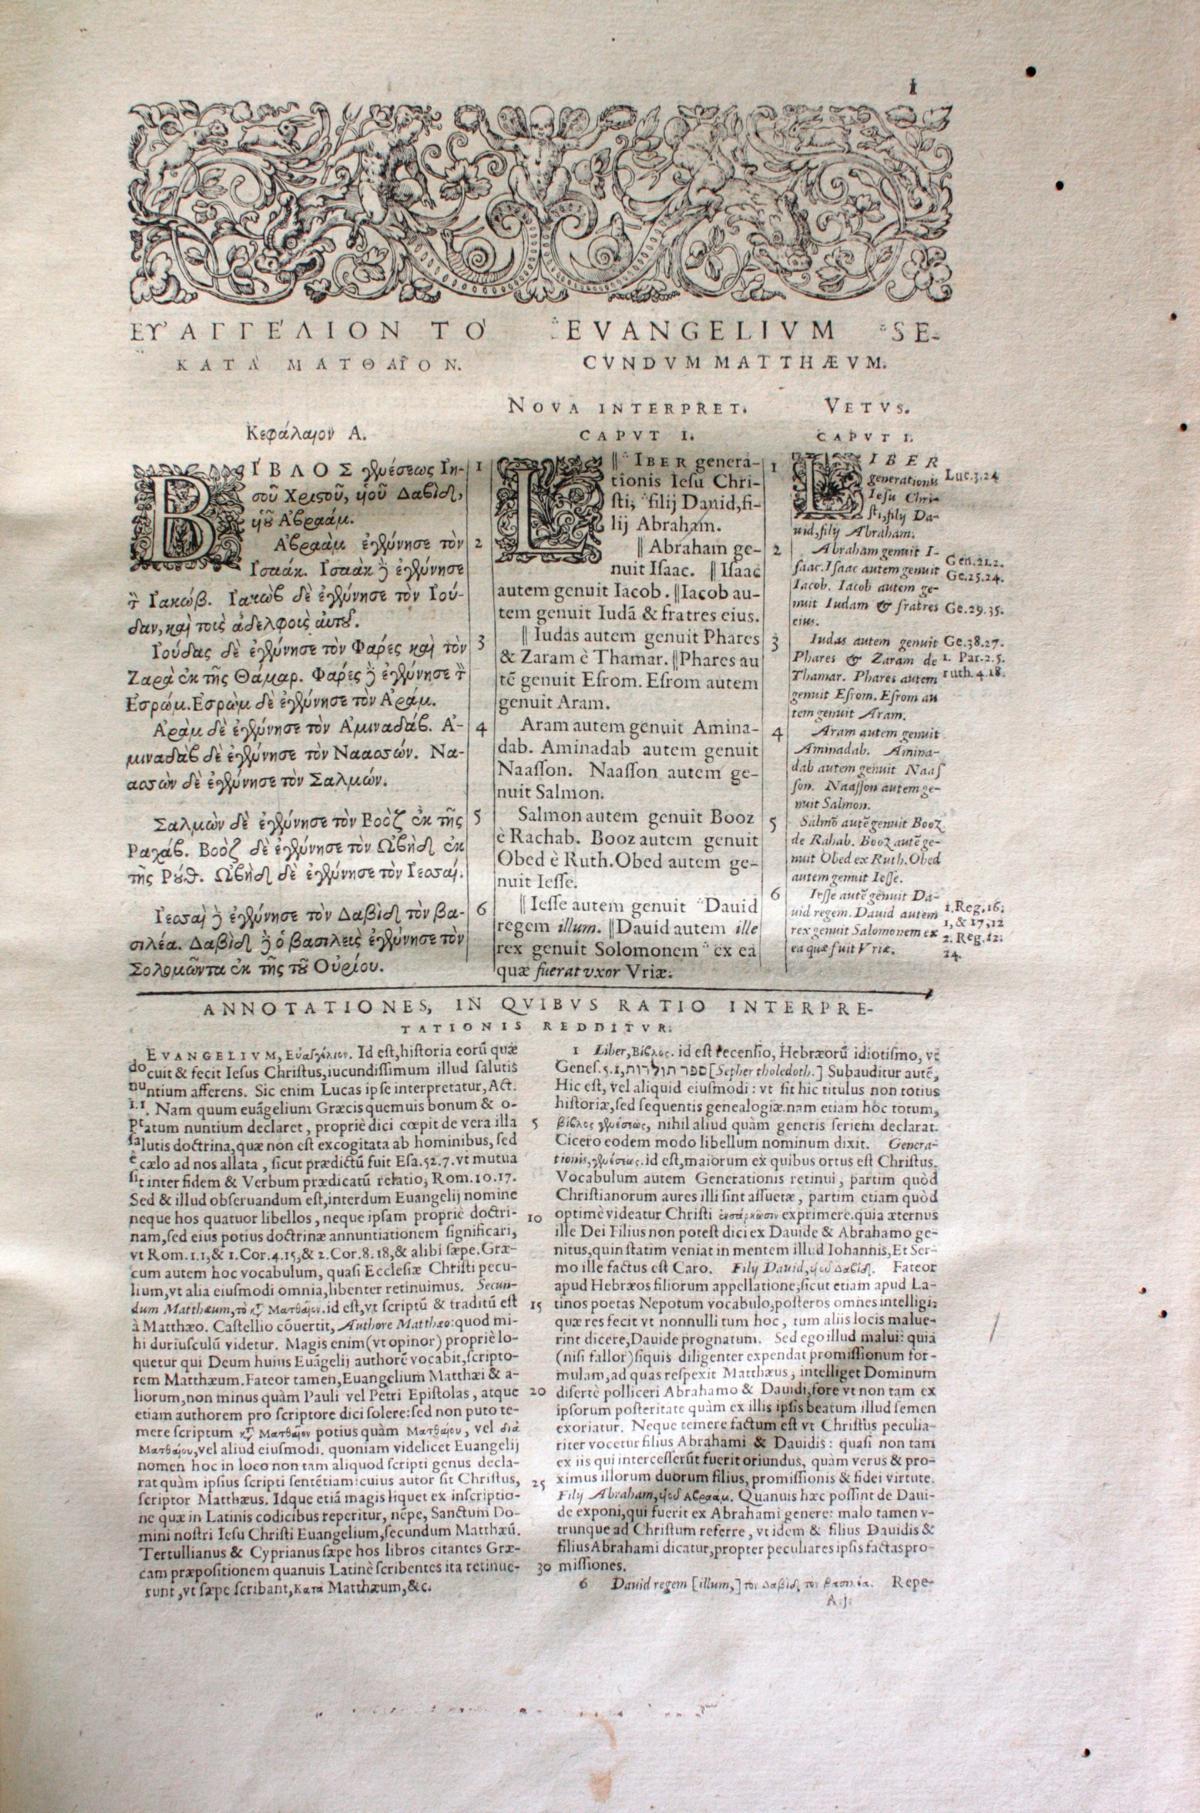 Griechische-Lateinische Bibel, Novum Testamentum 1582-7